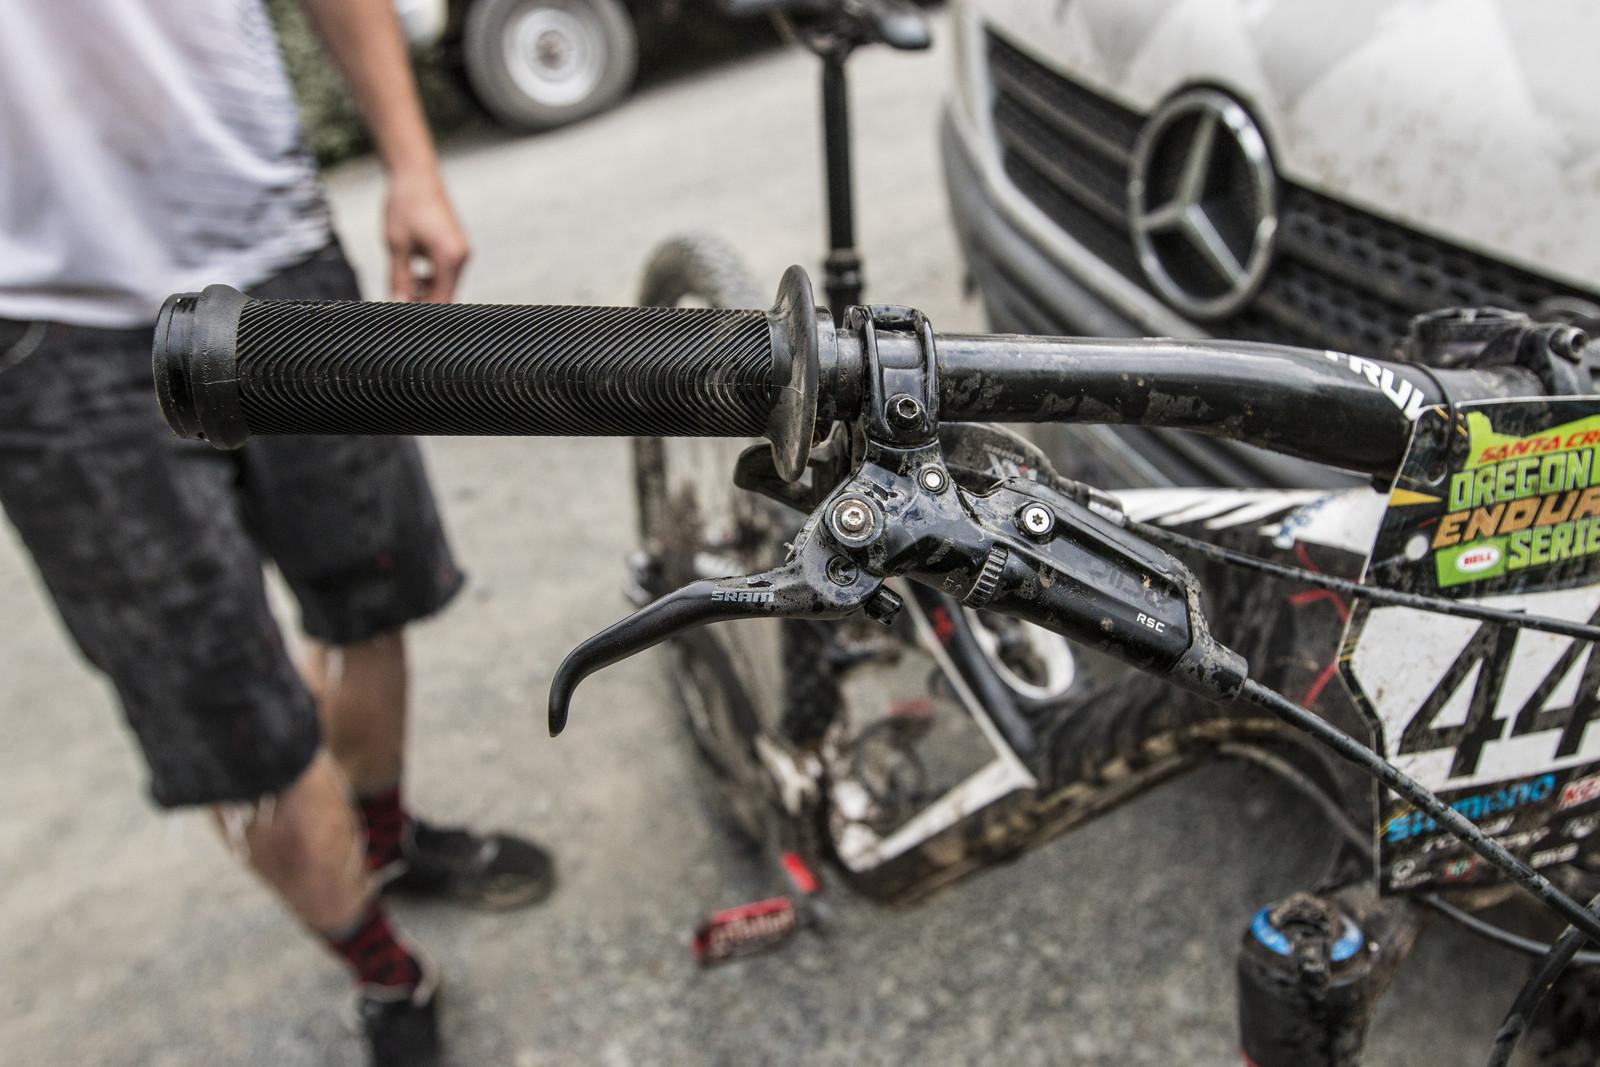 SRAM Guide Brakes on Kirt Voreis' Specialized Enduro 29 - WINNING BIKE: Kirt Voreis' Specialized Enduro 29 - Mountain Biking Pictures - Vital MTB